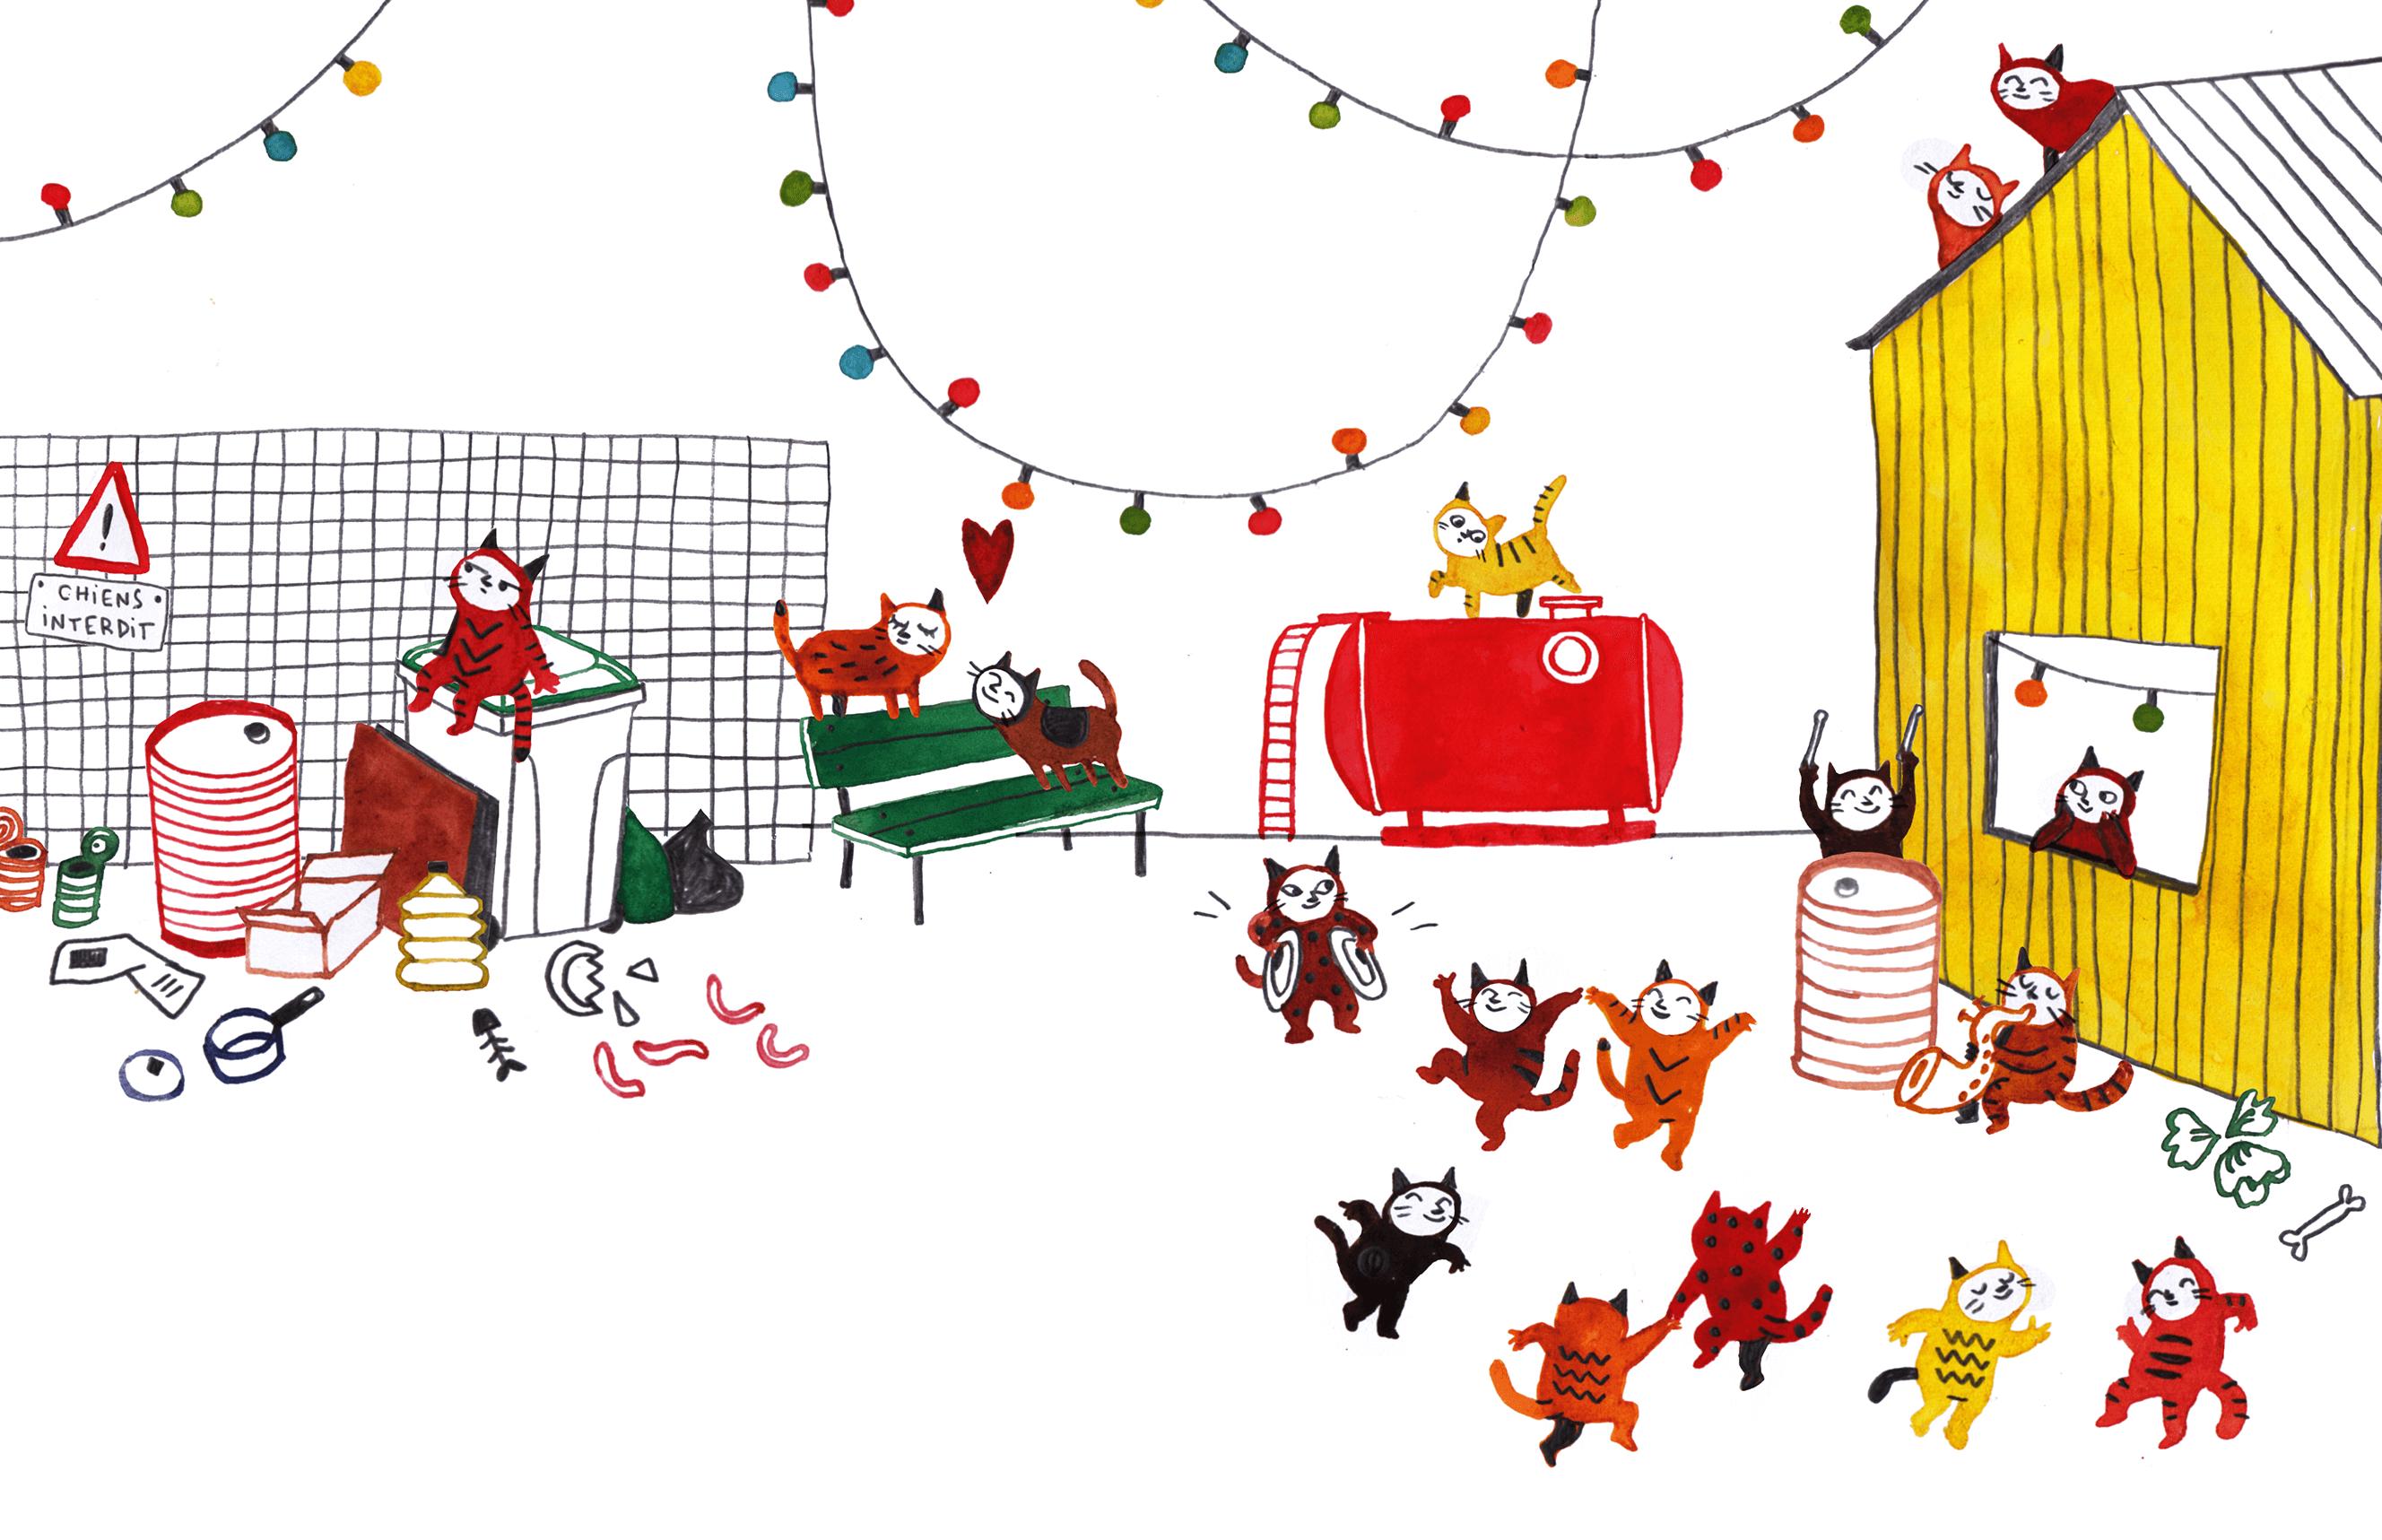 Kids' book illustration of cats dancing